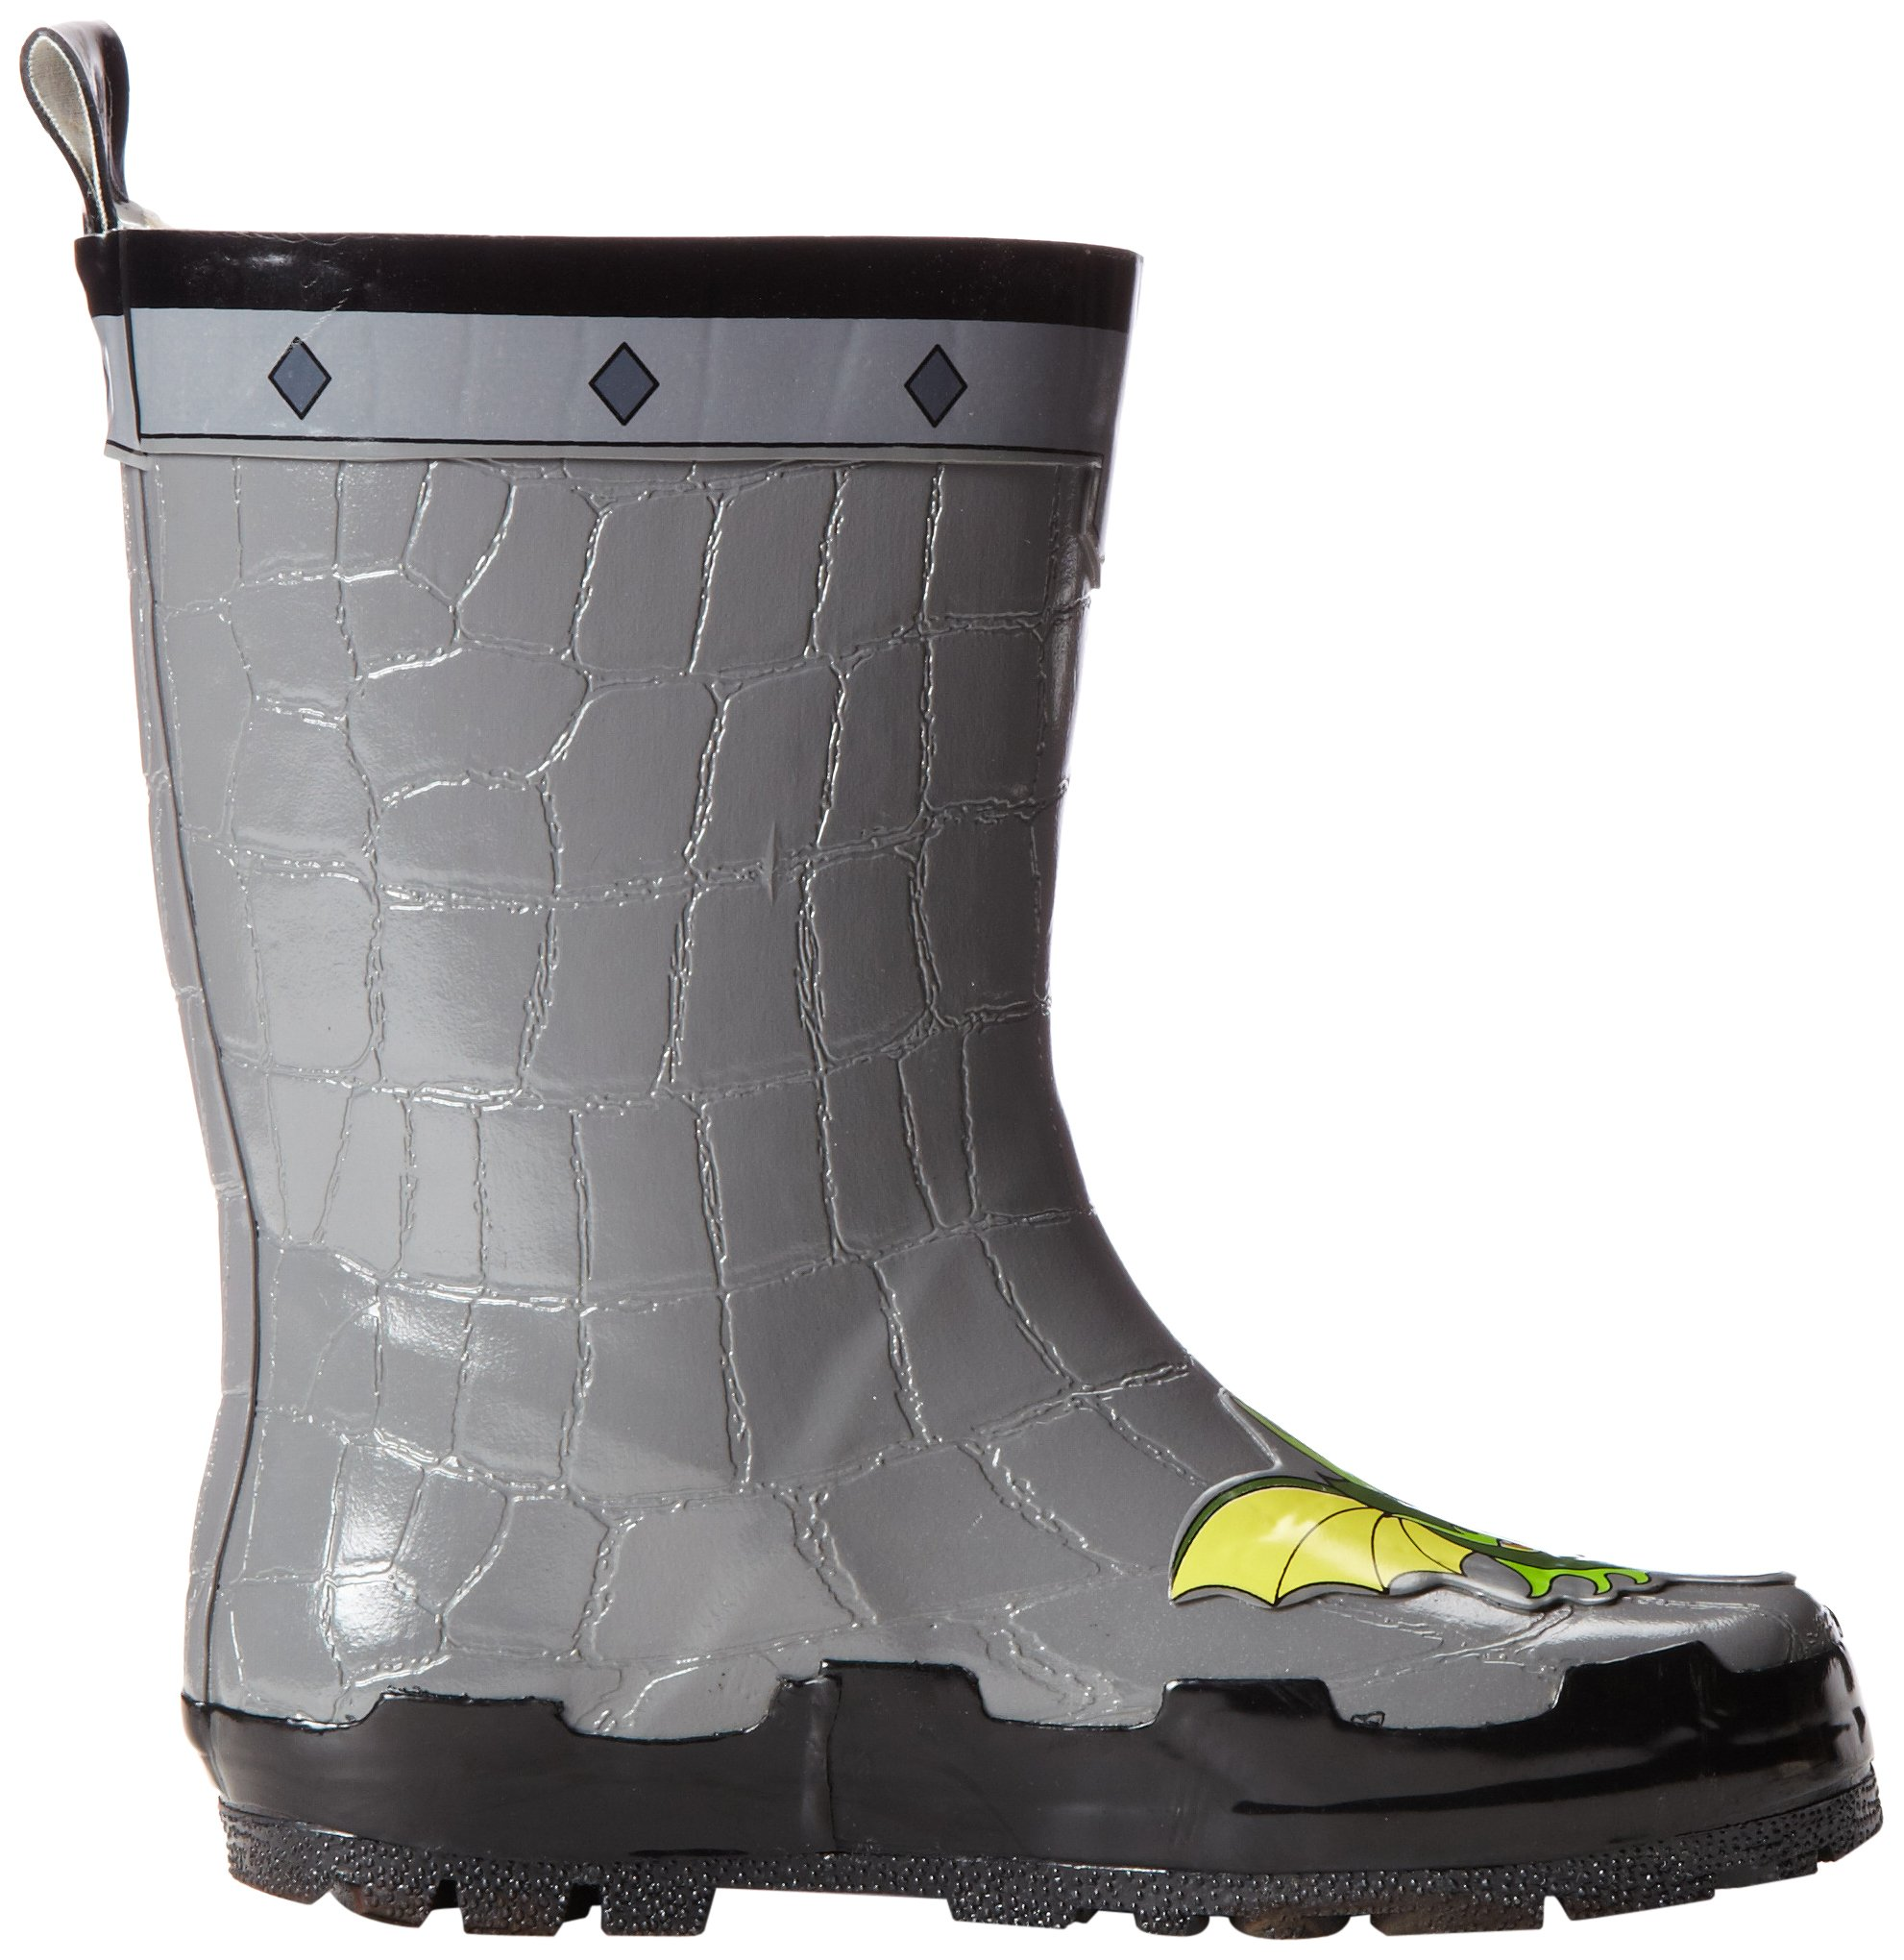 Kidorable Boys' Dragon Knight Rain Boot, Grey, 2 (Young Adult Size) by Kidorable